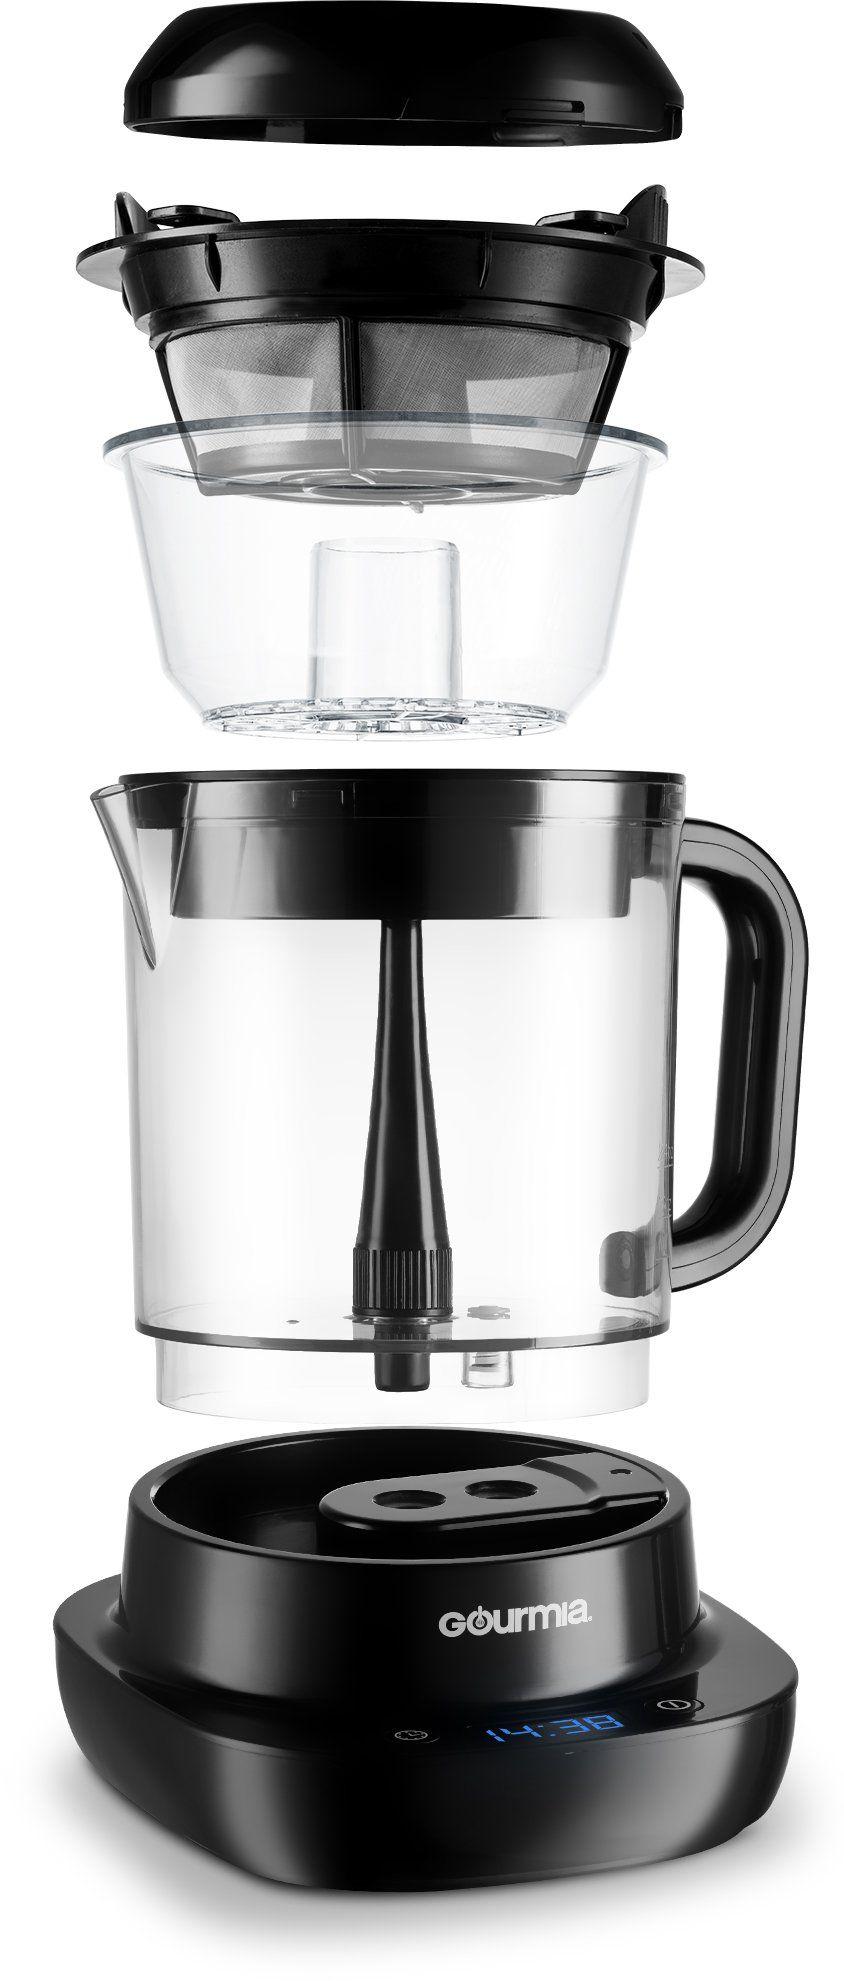 Gourmia GCM6800 Automatic Cold Brew Coffee Maker 10